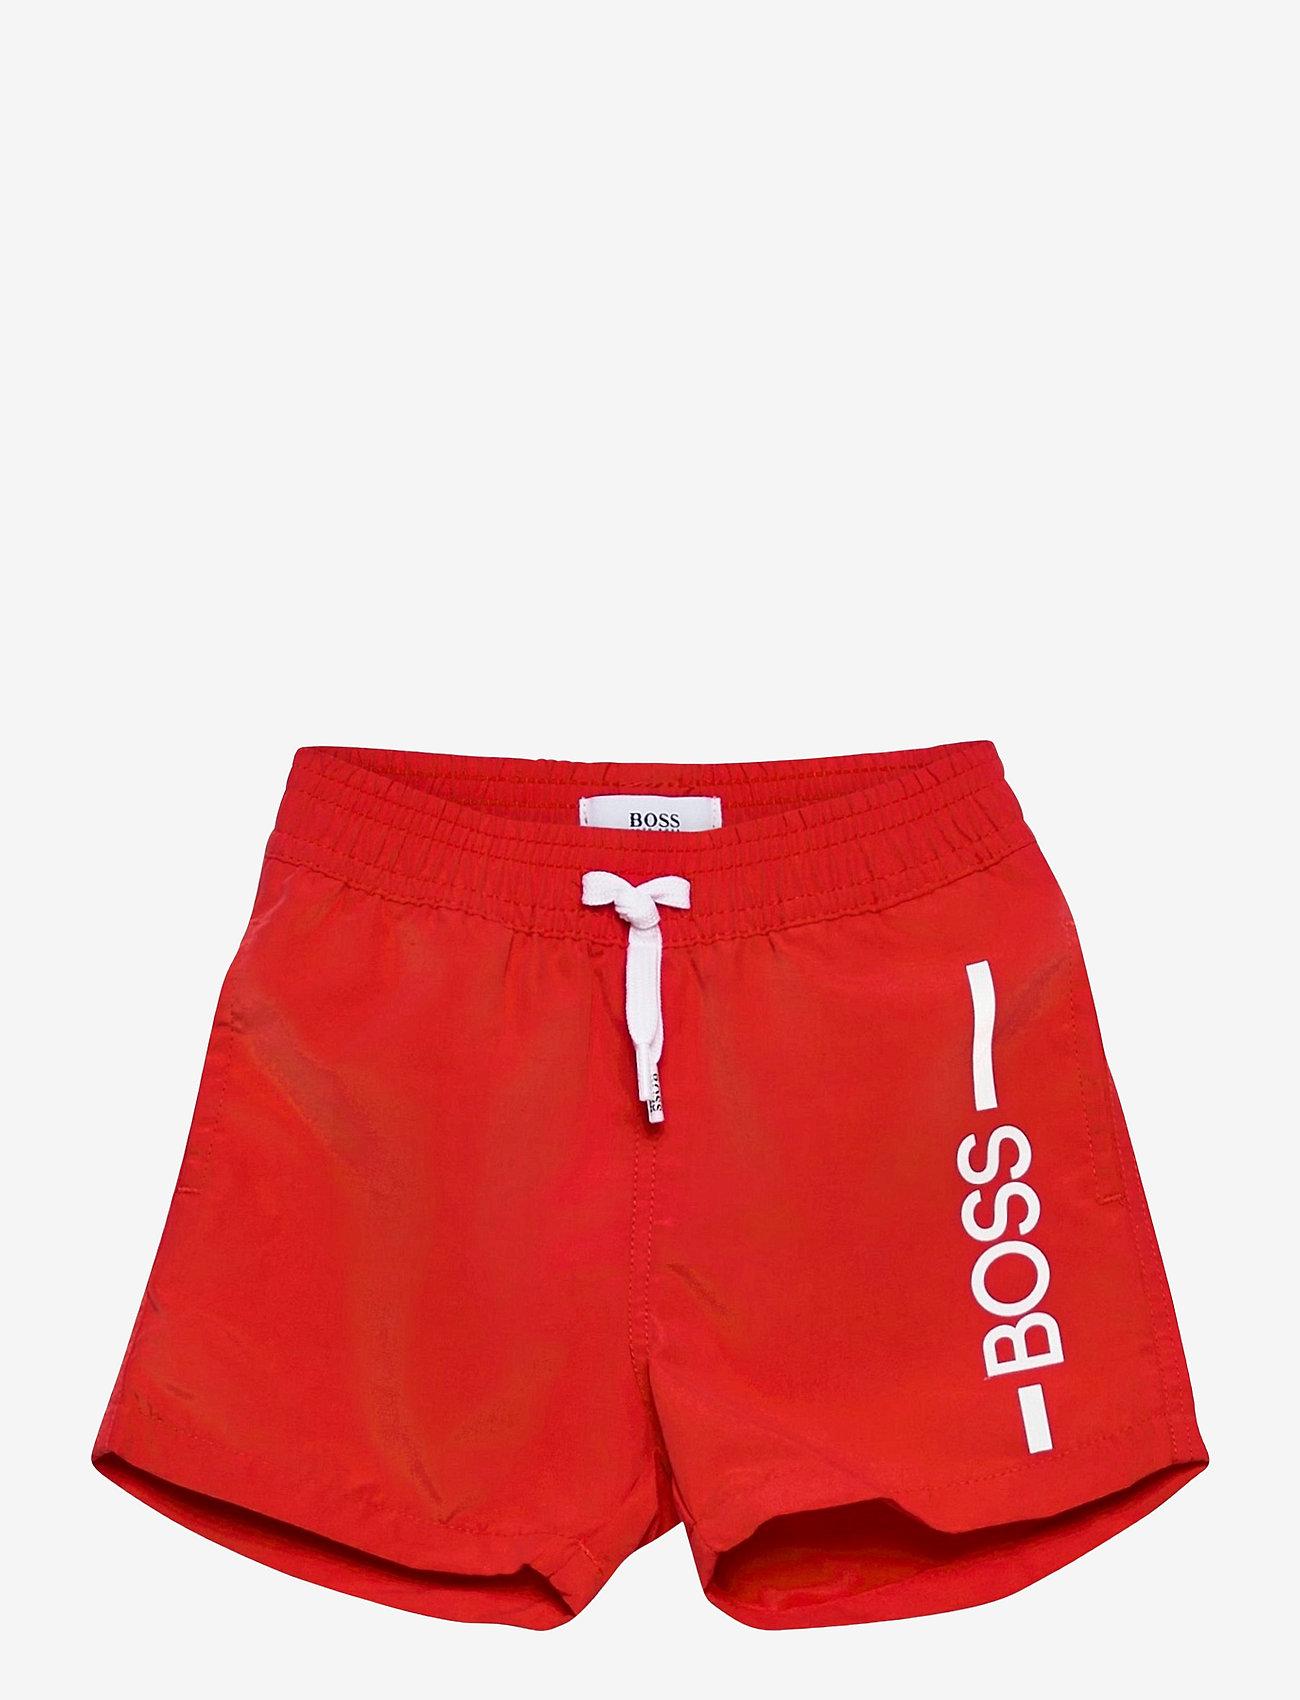 BOSS - SWIM SHORTS - badehosen - bright red - 0